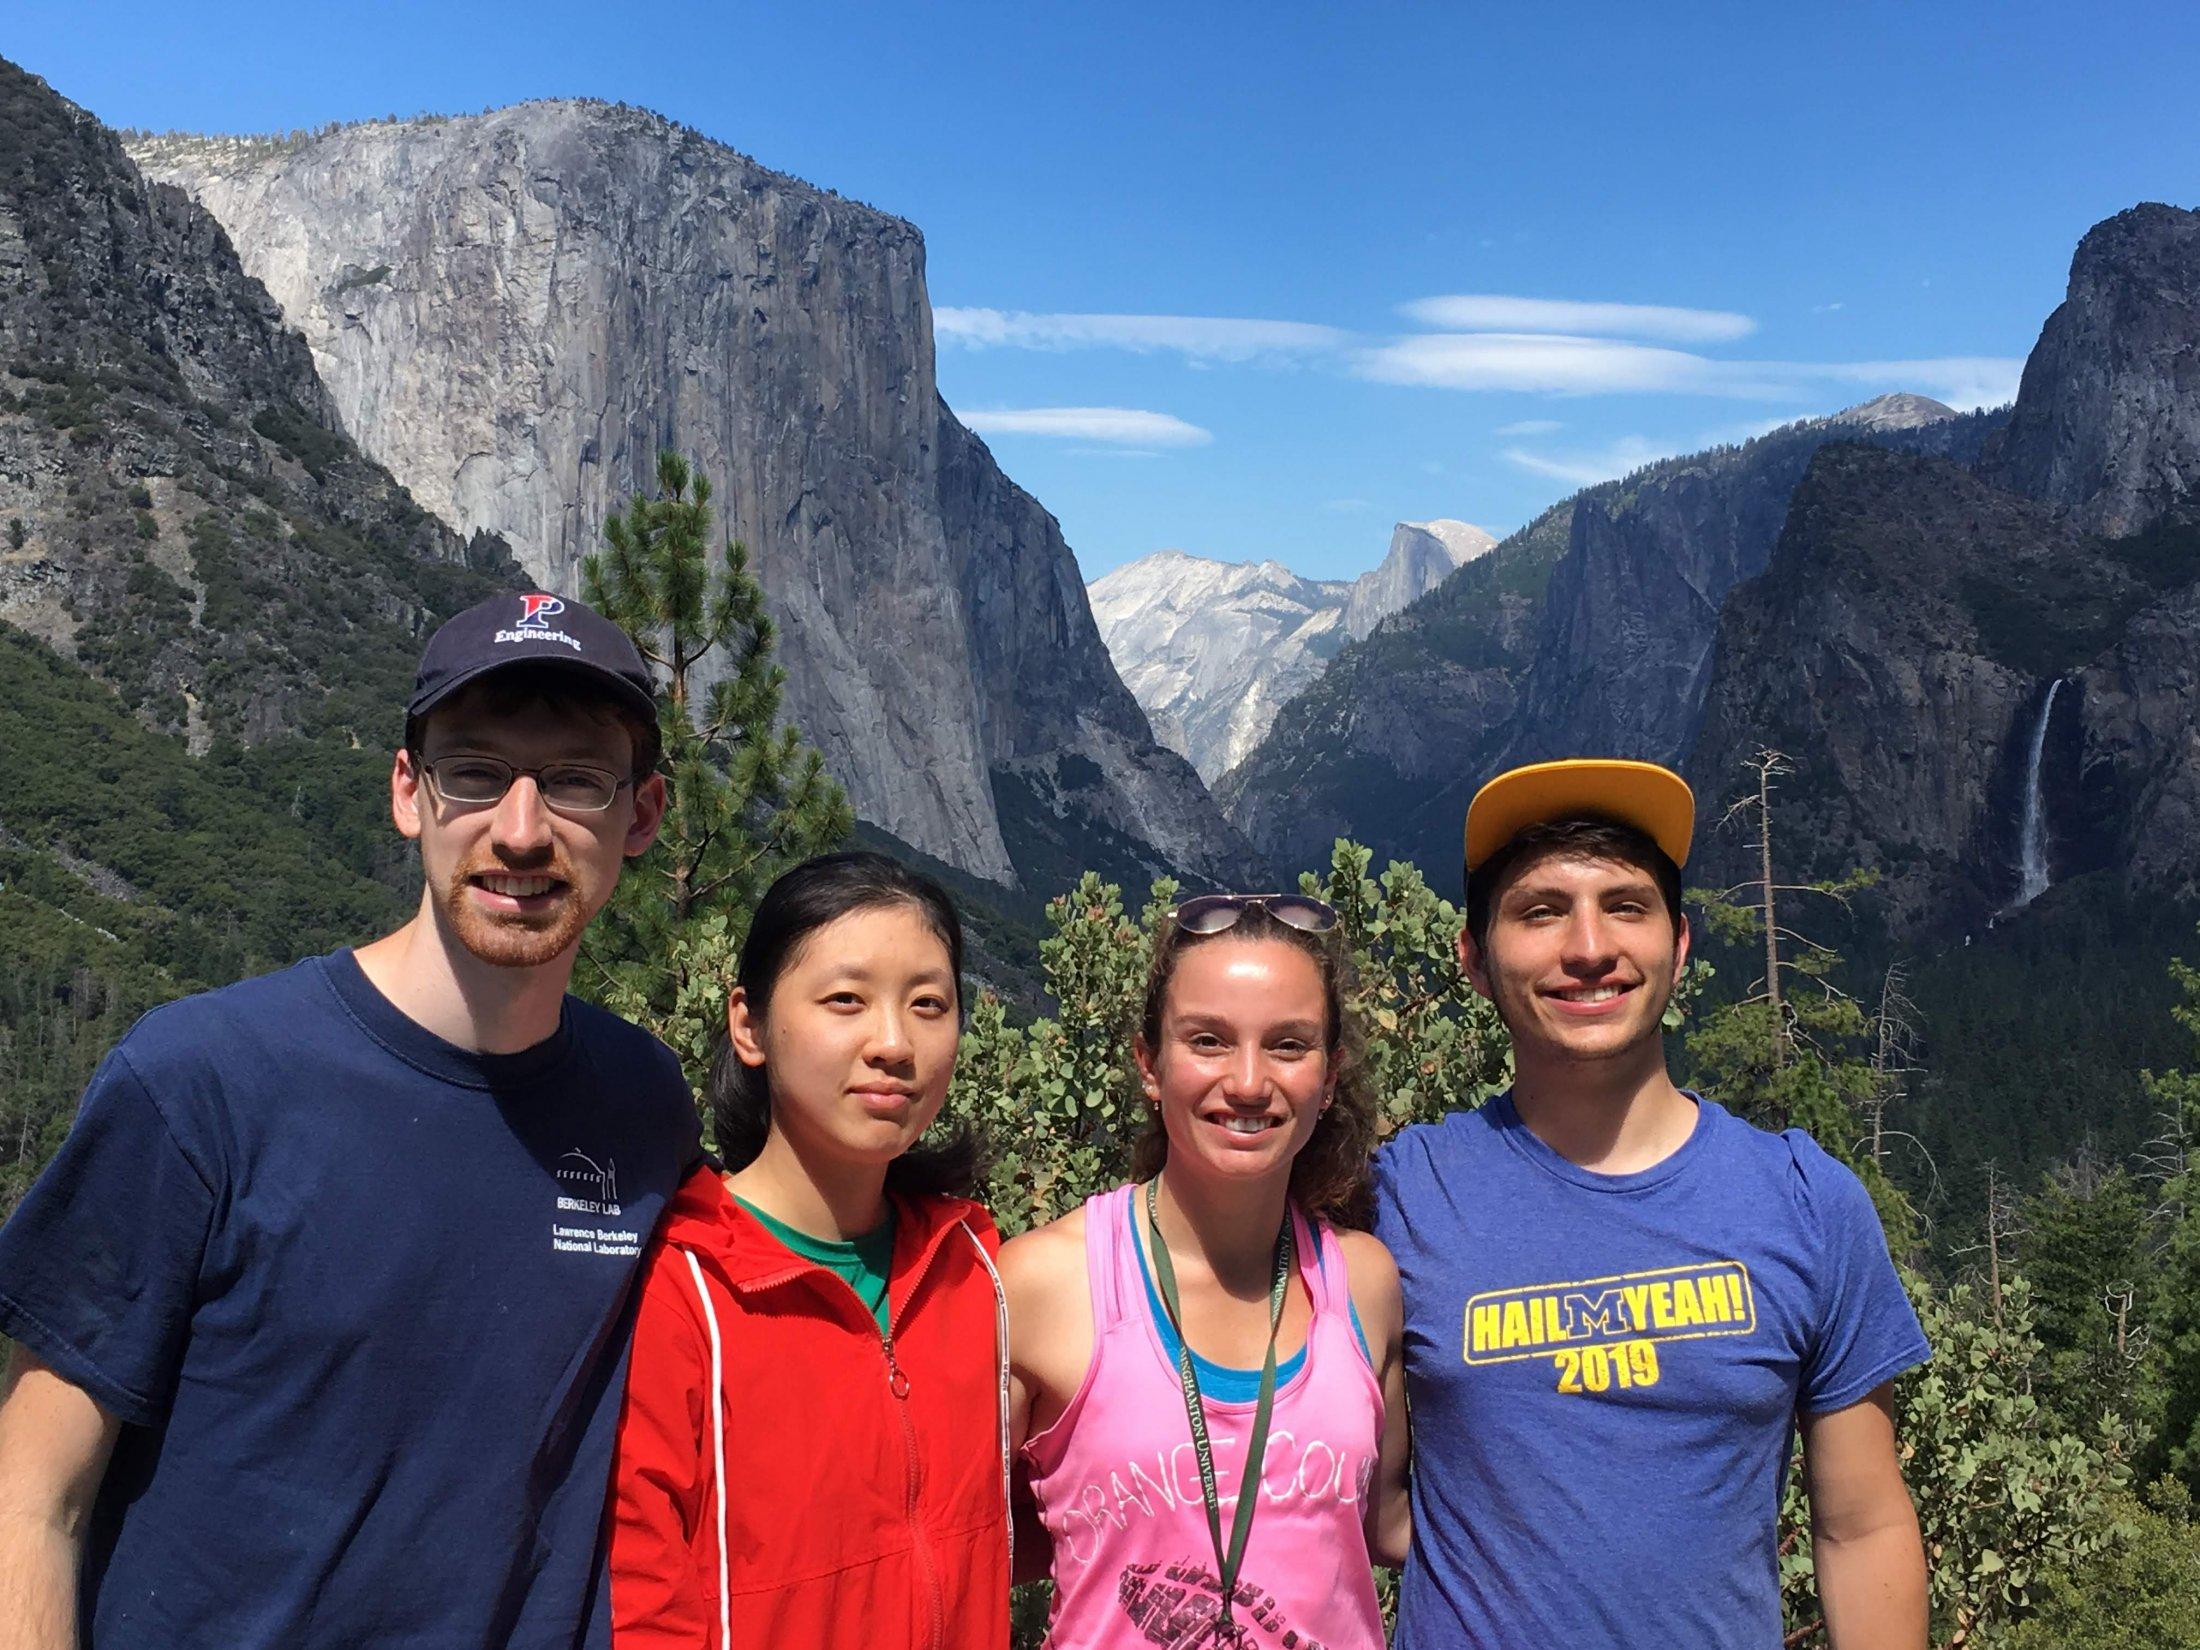 Hiking at Yosemite